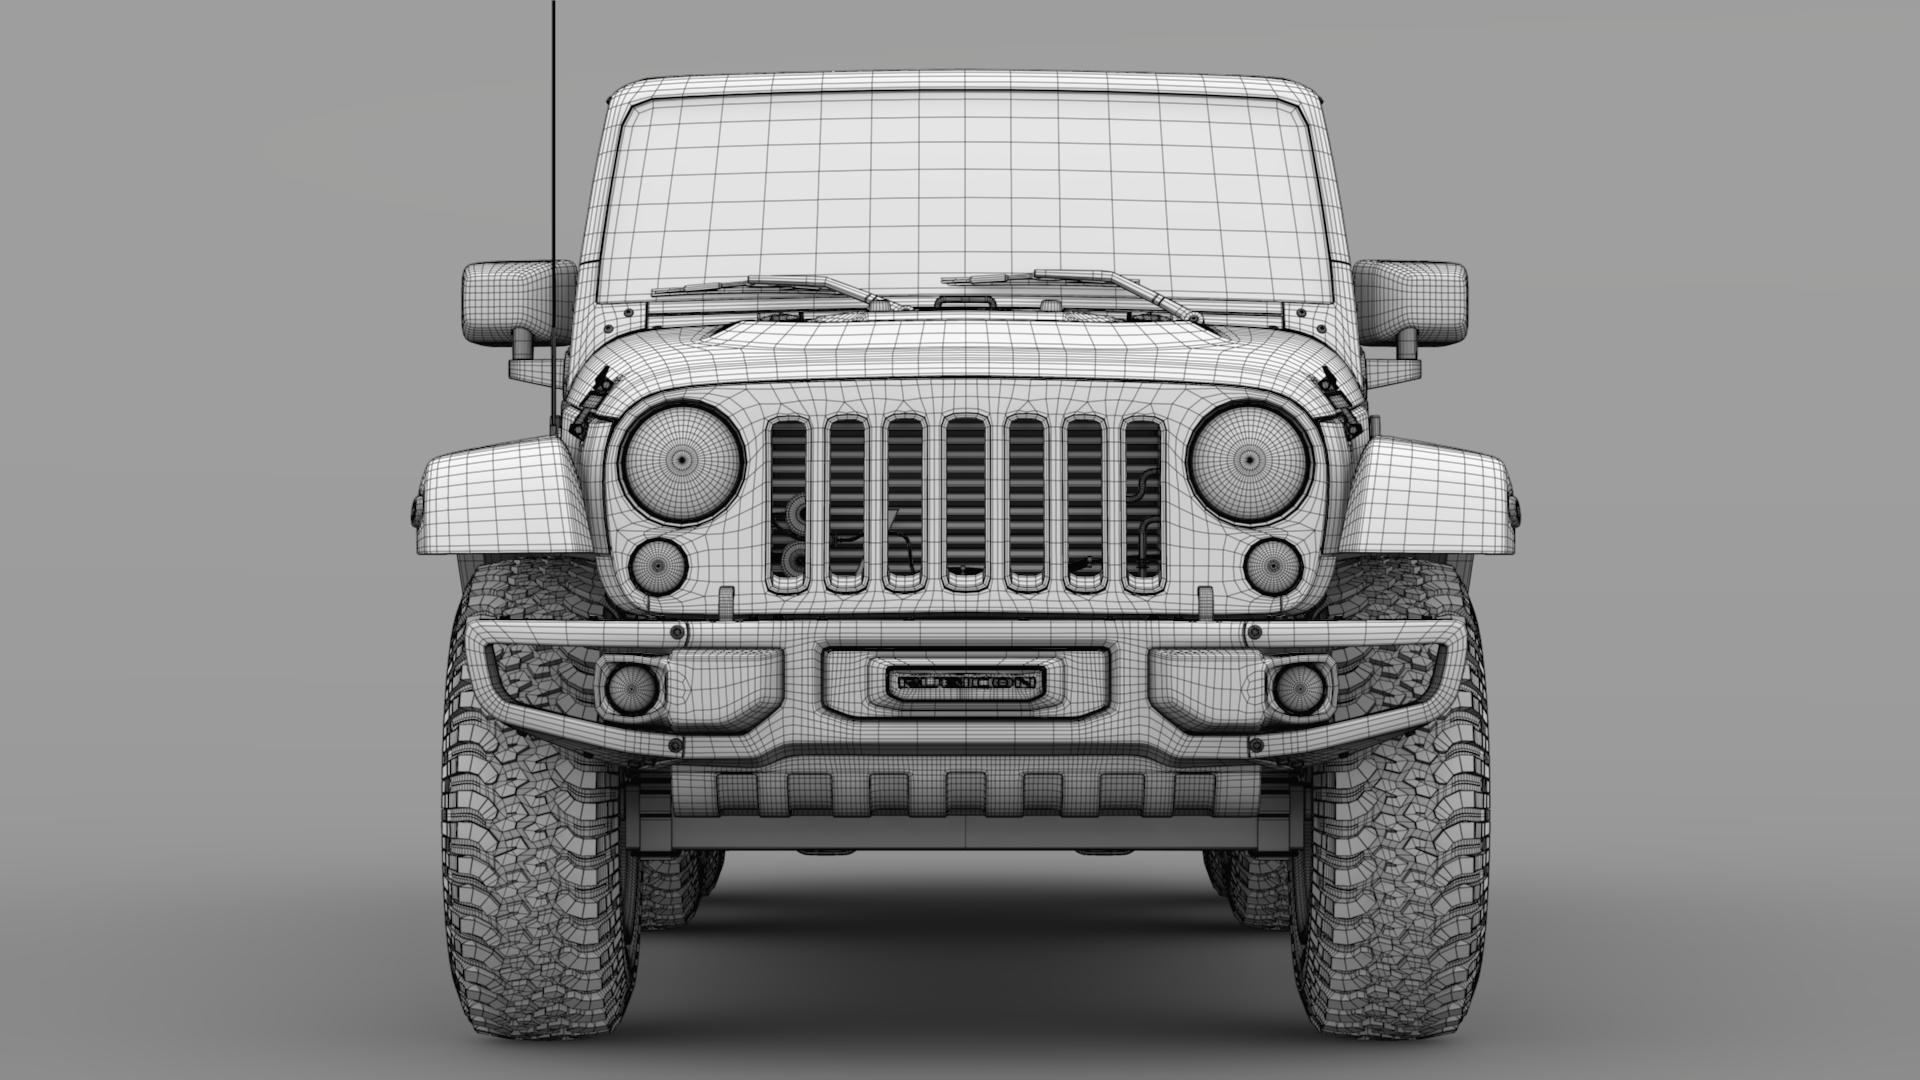 jeep wrangler 6×6 rubicon recon jk 2017 3d model max fbx c4d lwo ma mb hrc xsi obj 276852